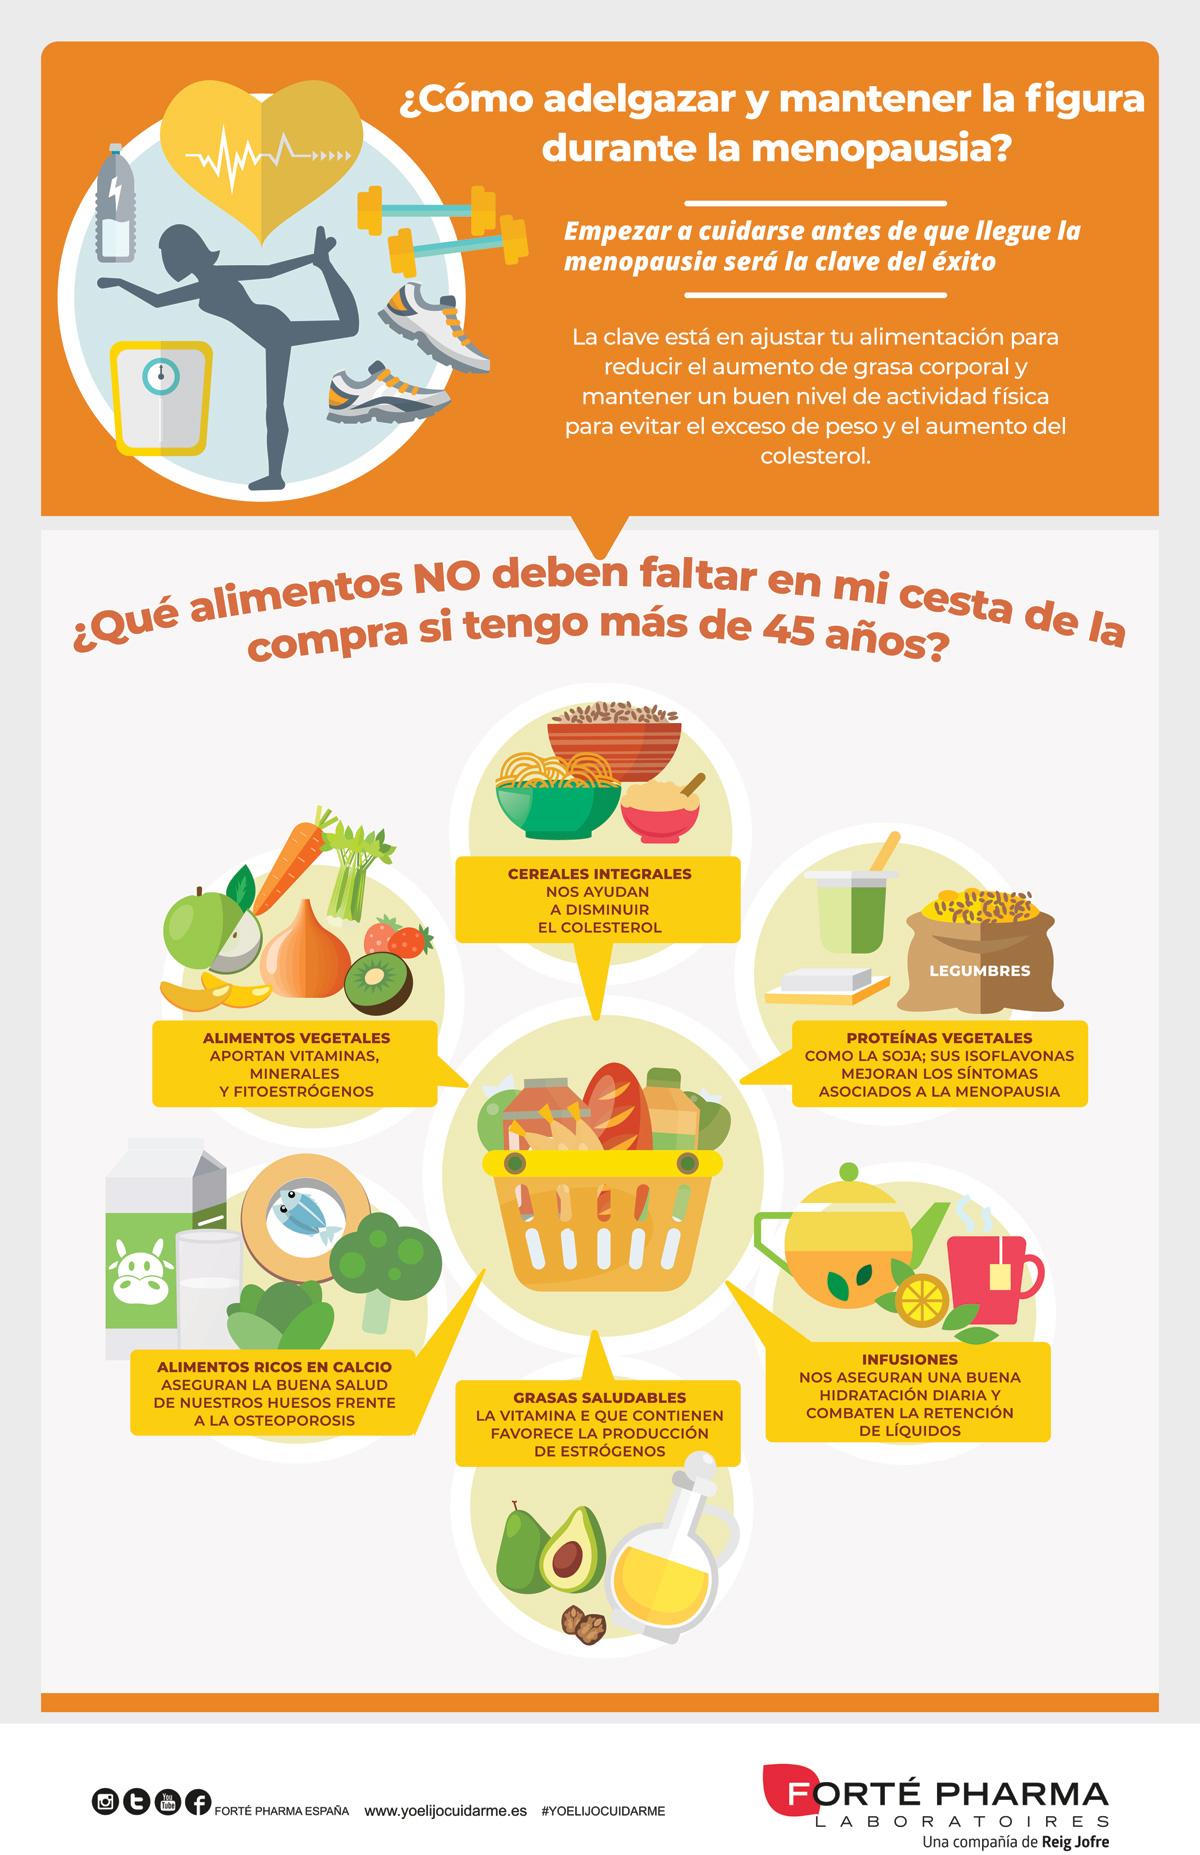 dieta-adelgazar-perder-peso-menopausia-.jpg